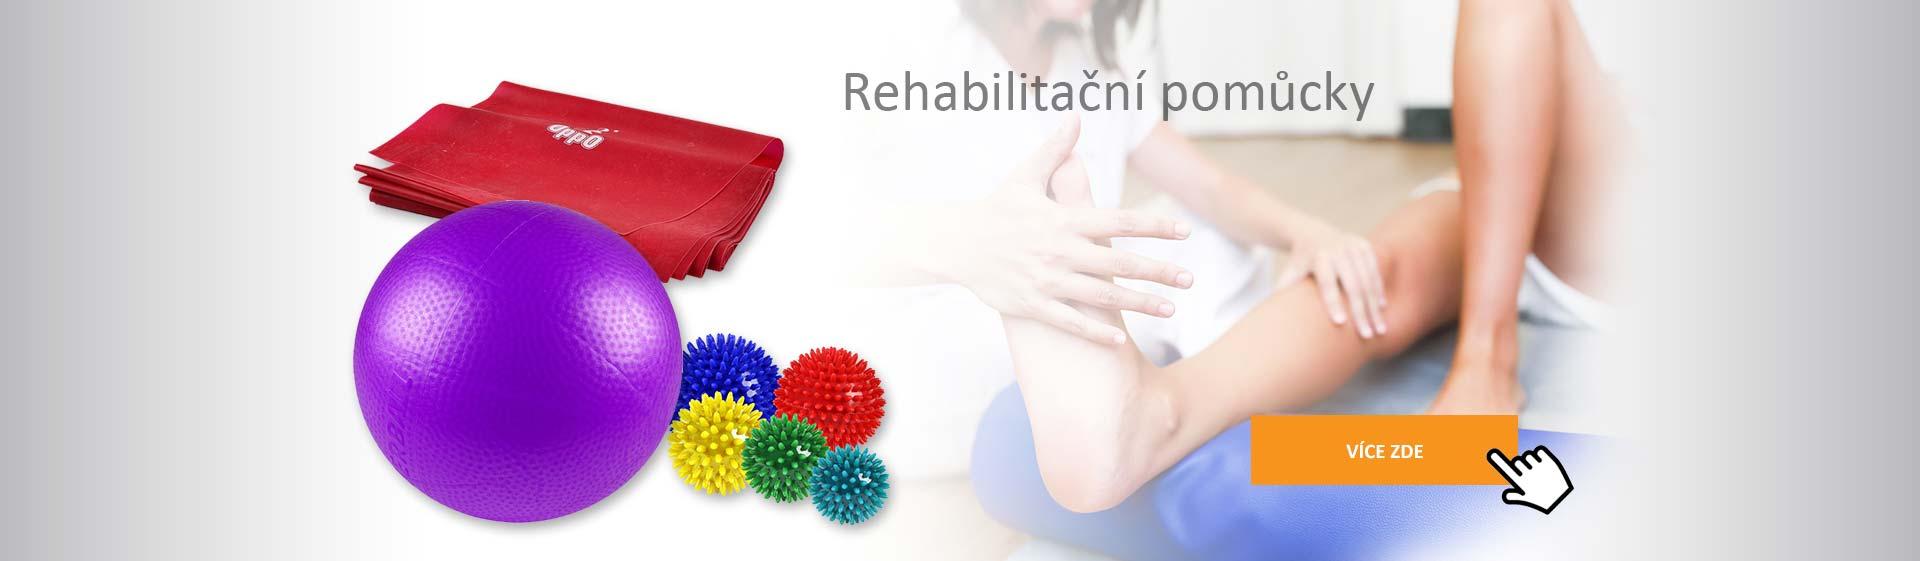 CZ Rehabilitace